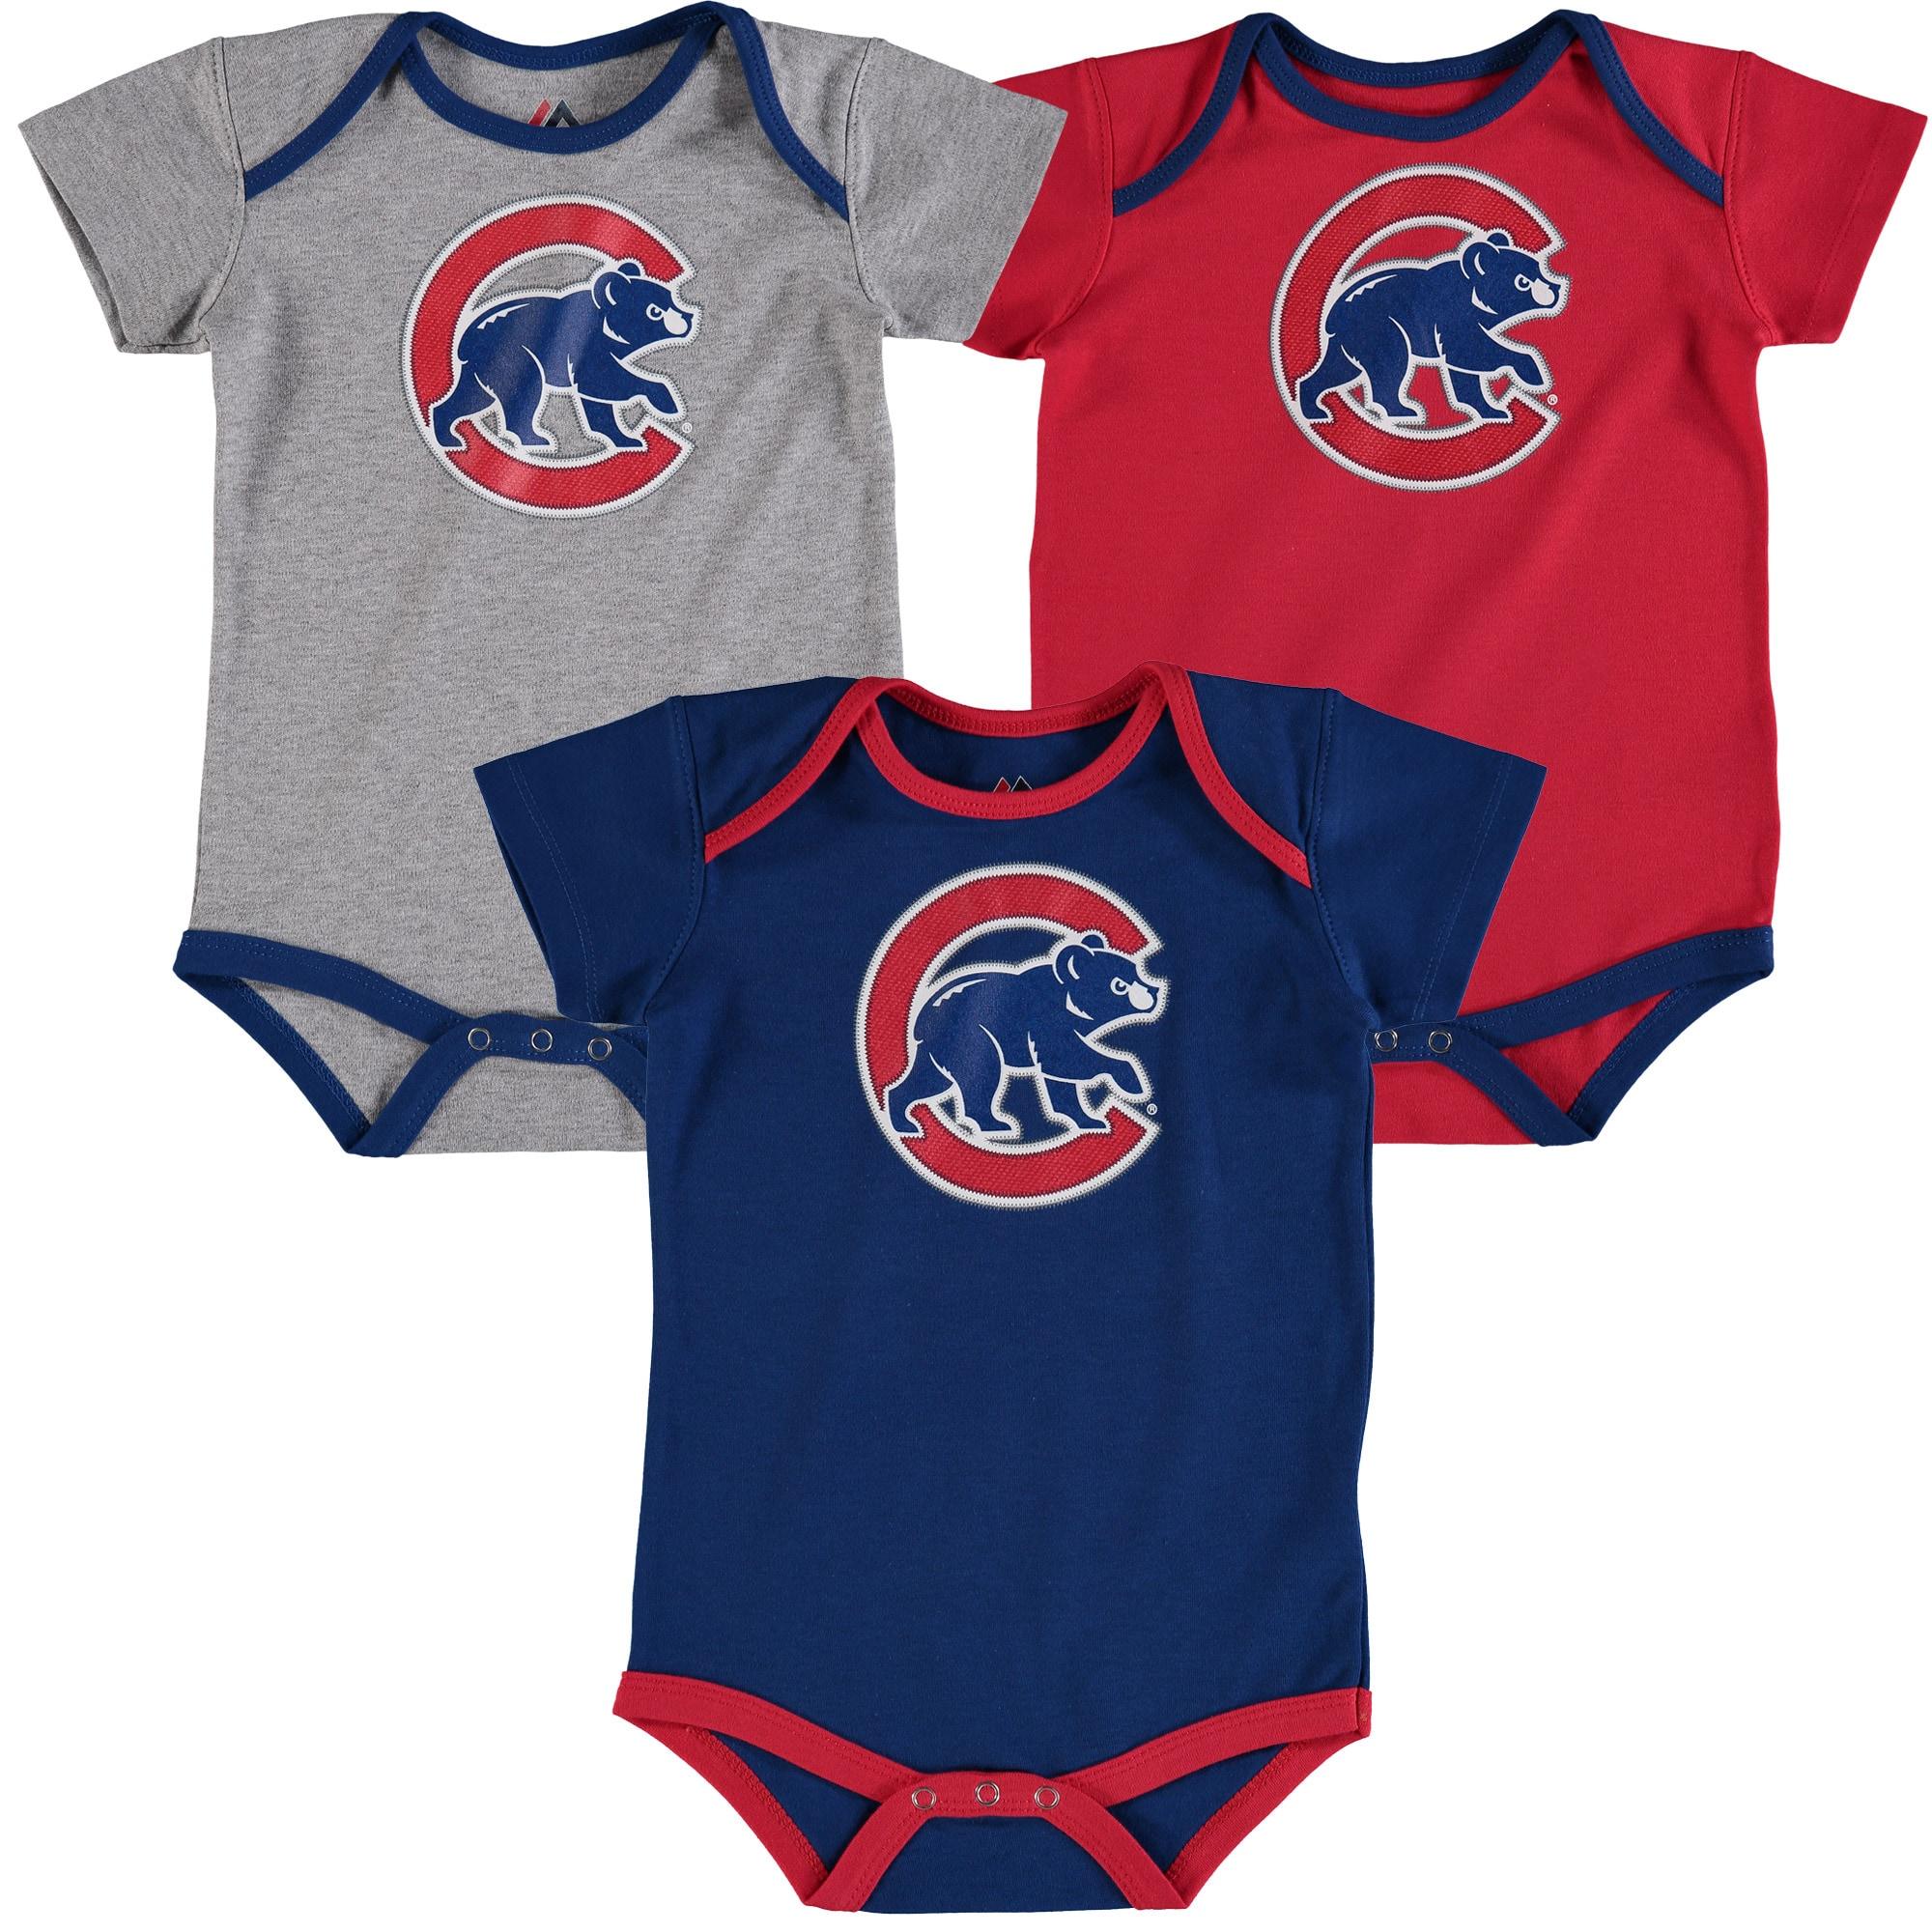 Kris Bryant Chicago Cubs Majestic Infant Name & Number 3-Pack Bodysuit Set - Red/Royal/Gray